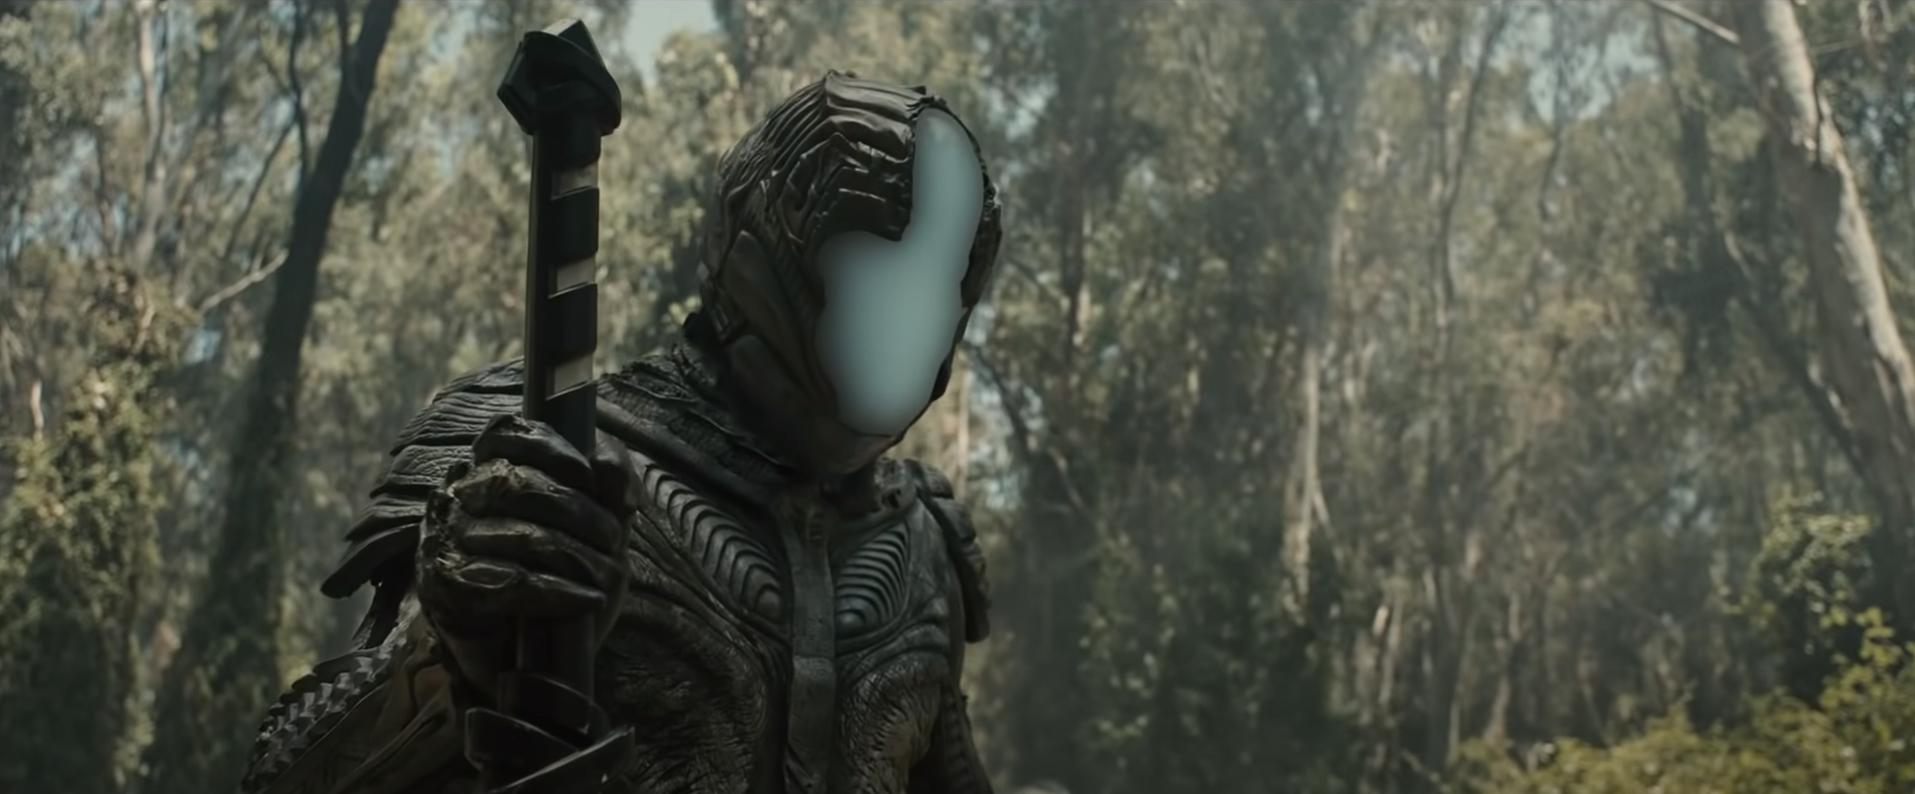 Alien Ninja Warrior in Nicolas Cage Jiu Jitsu movie trailer on Cinematic Doctrine Christian Podcast